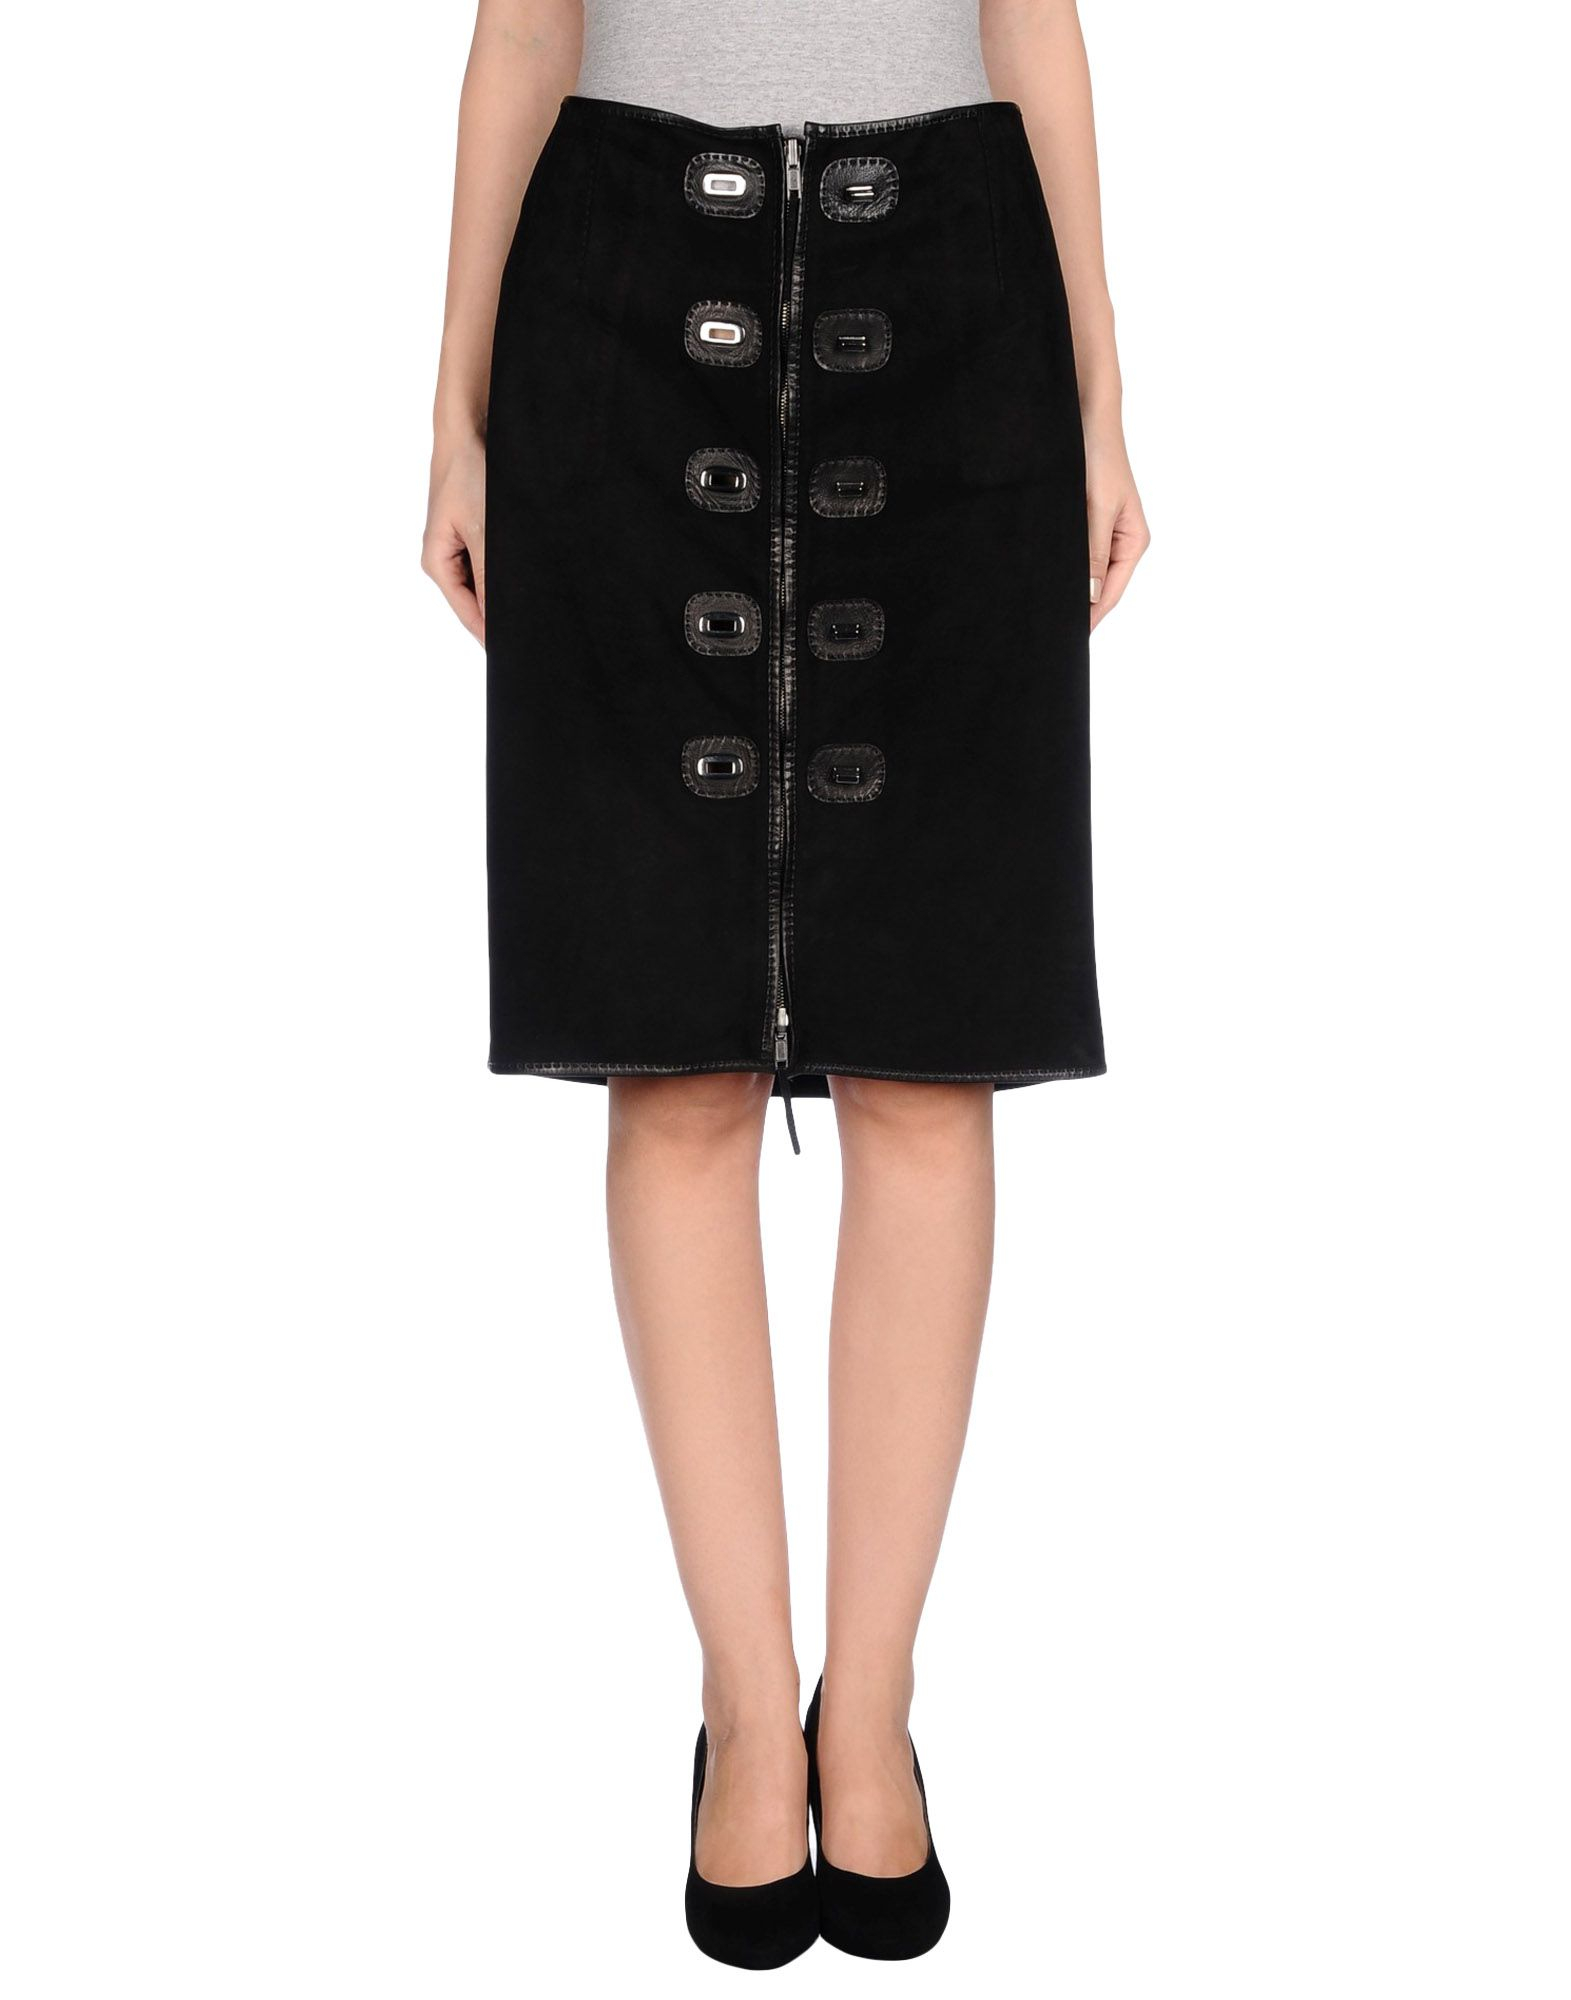 jean paul gaultier knee length skirt in black lyst